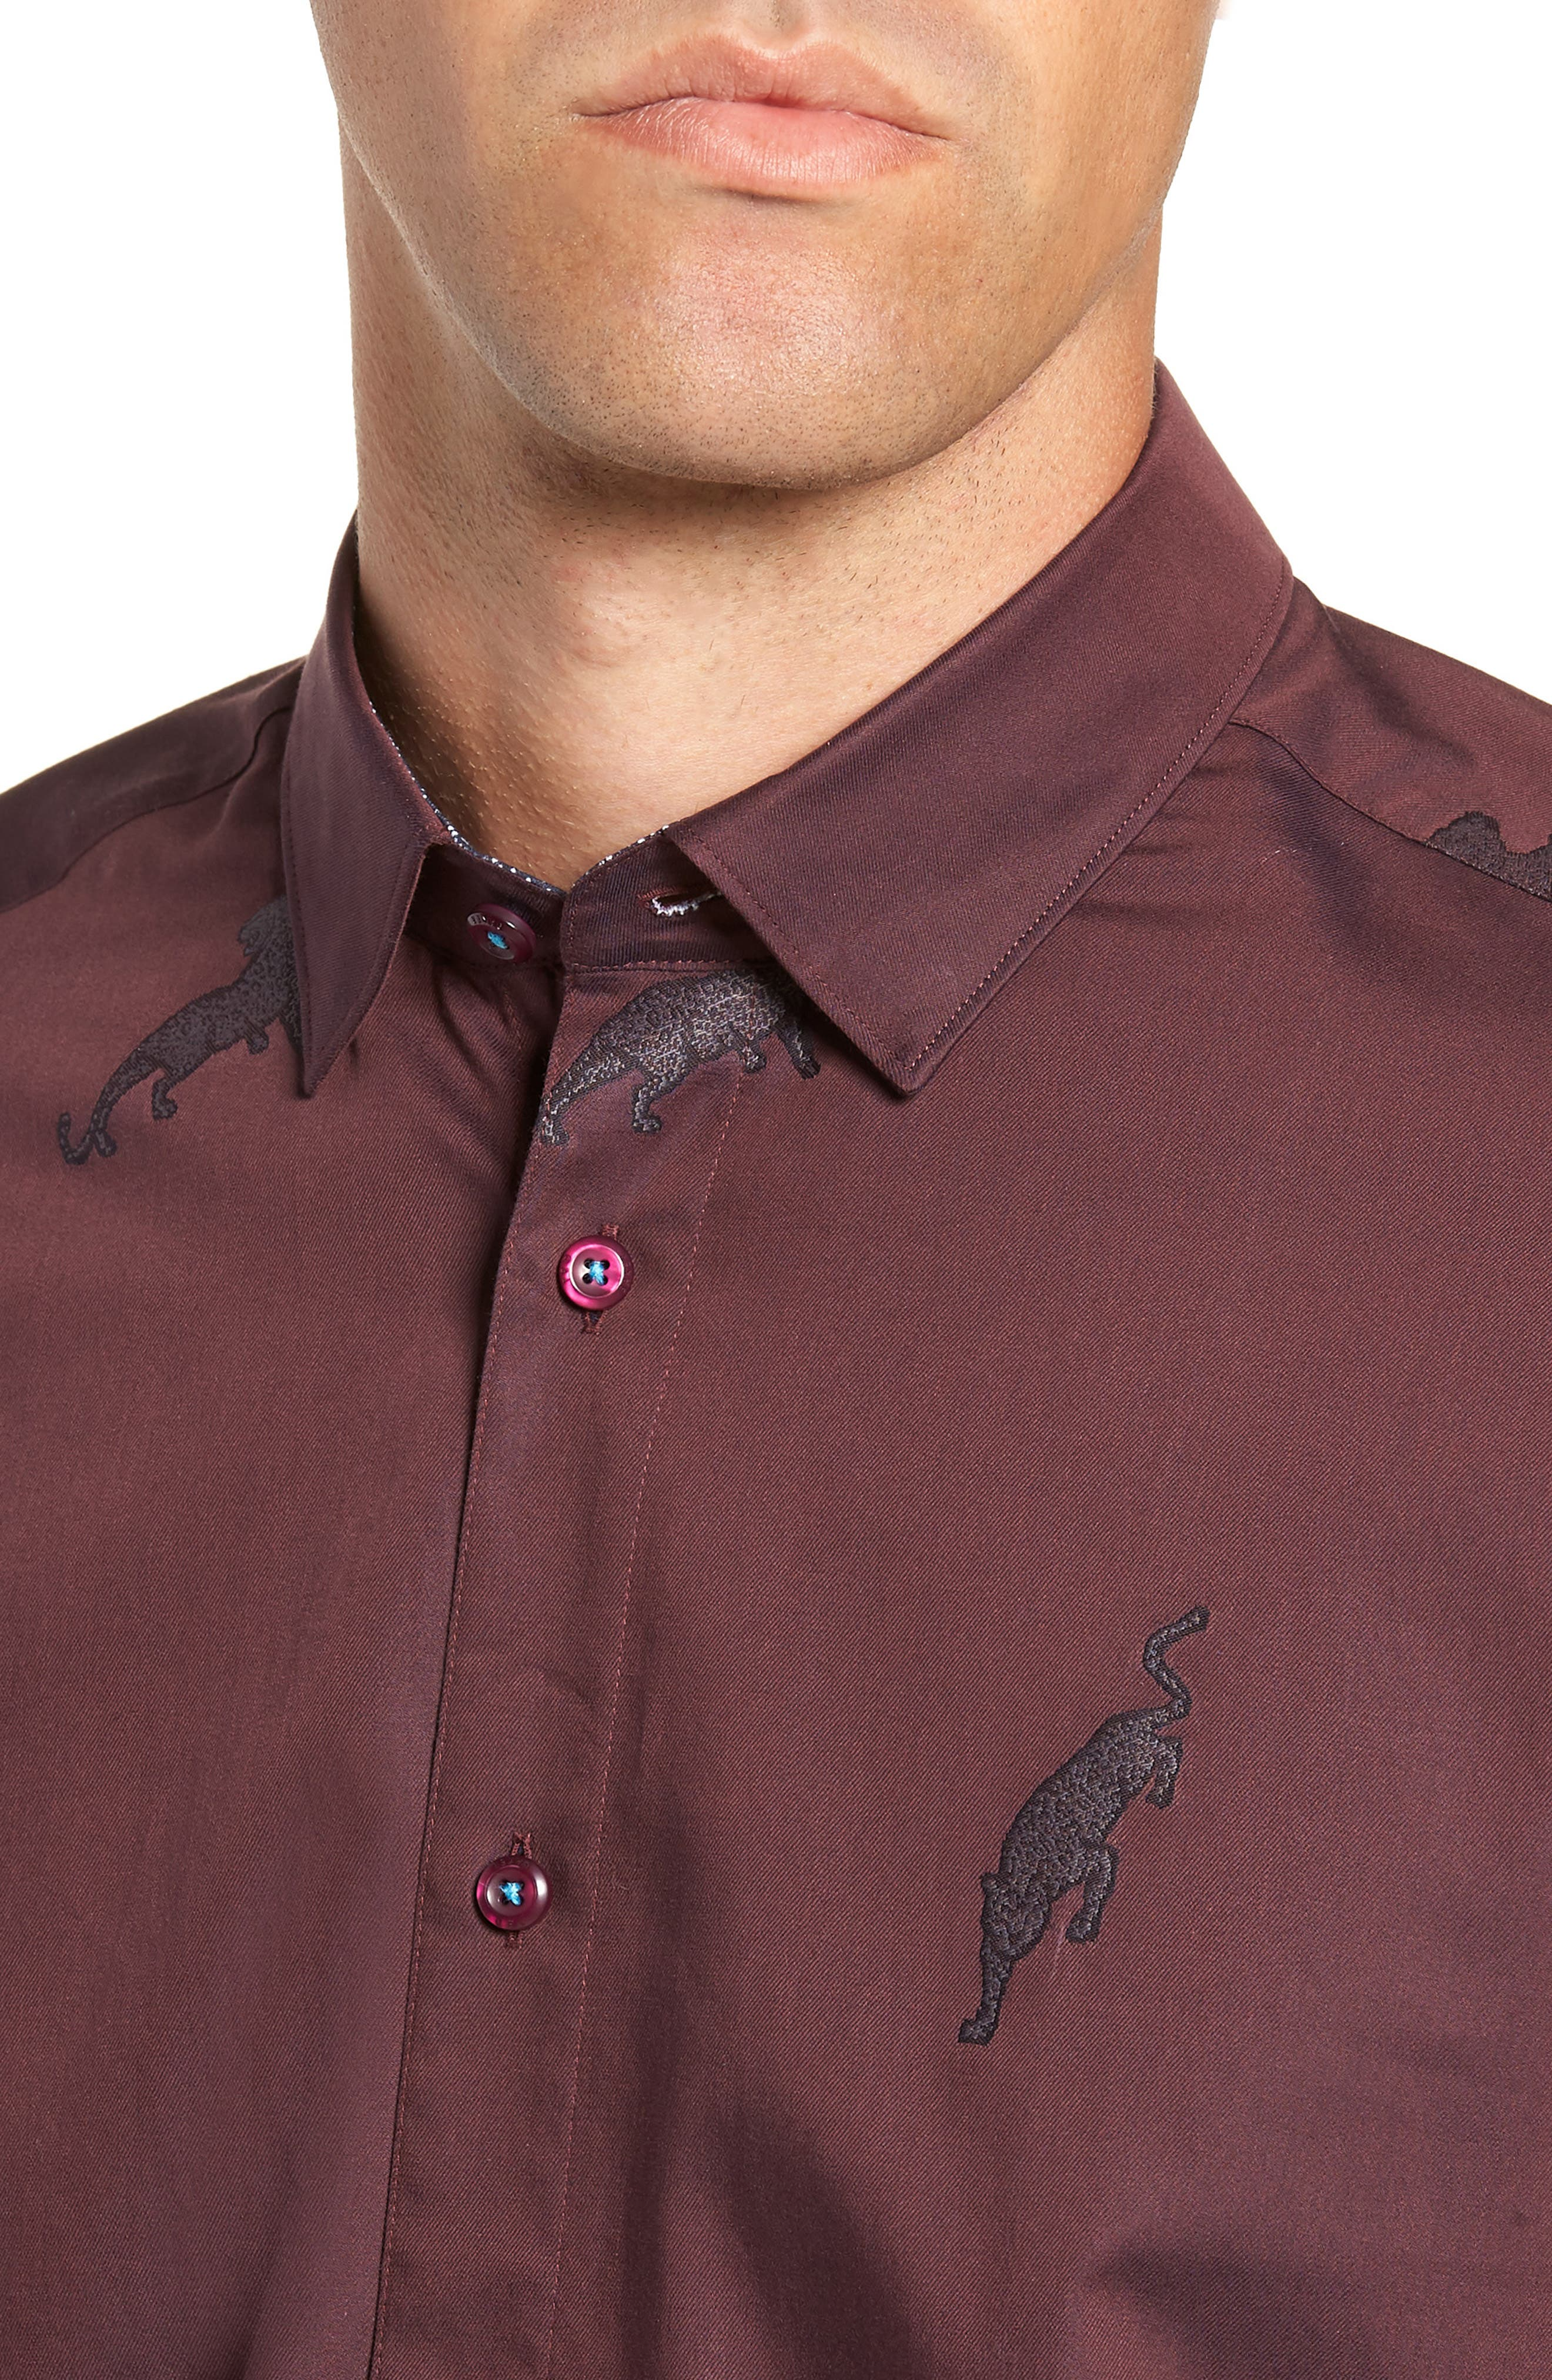 Bean Modern Fit Print Dress Shirt,                             Alternate thumbnail 2, color,                             DARK RED